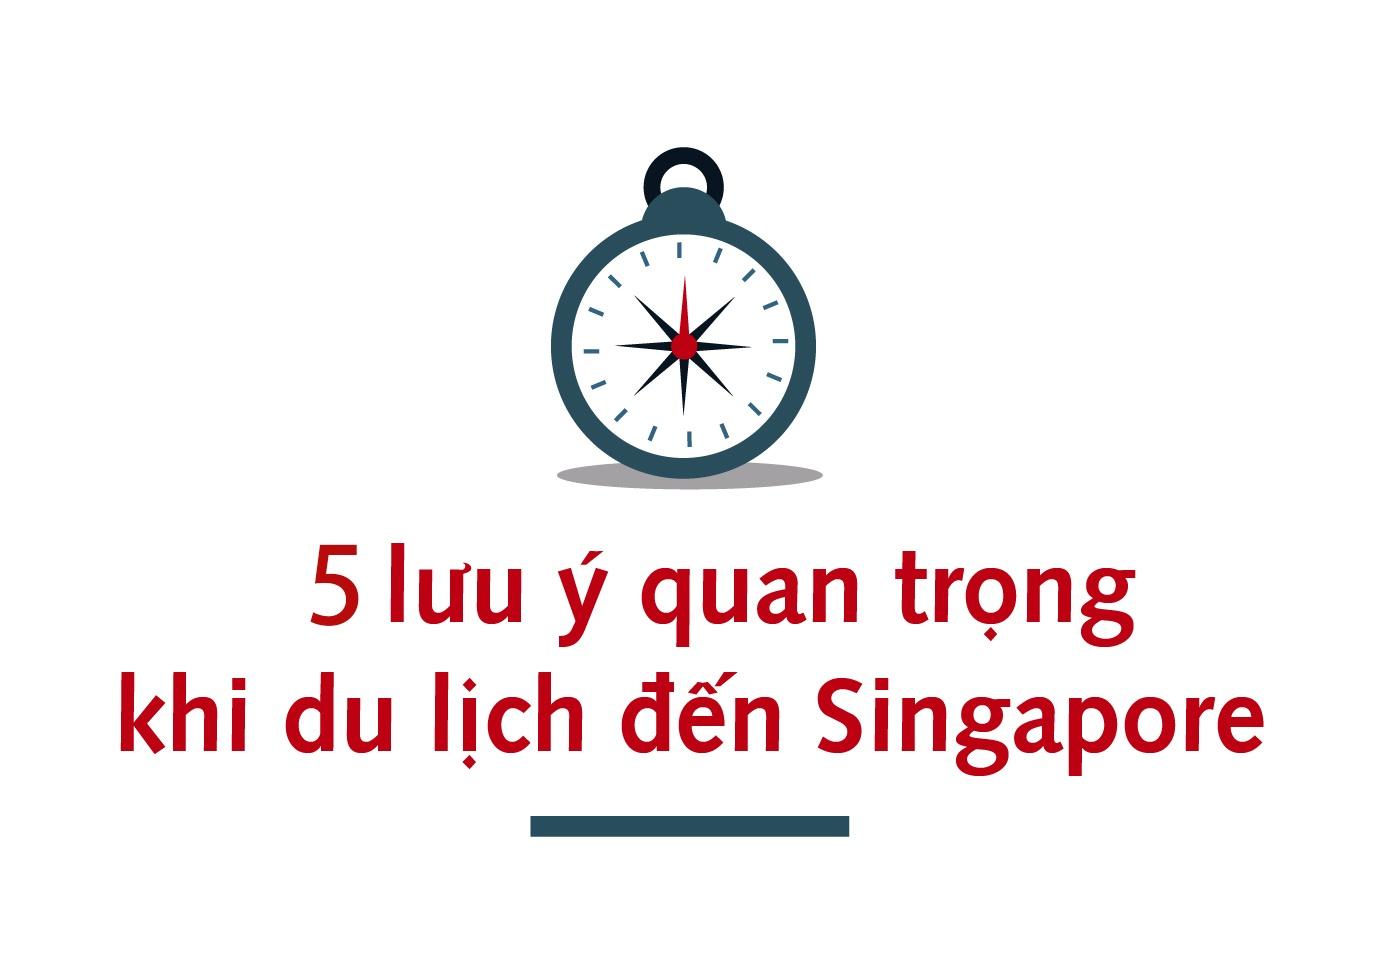 Du lich tu tuc Singapore va tat ca kinh nghiem phai biet hinh anh 45